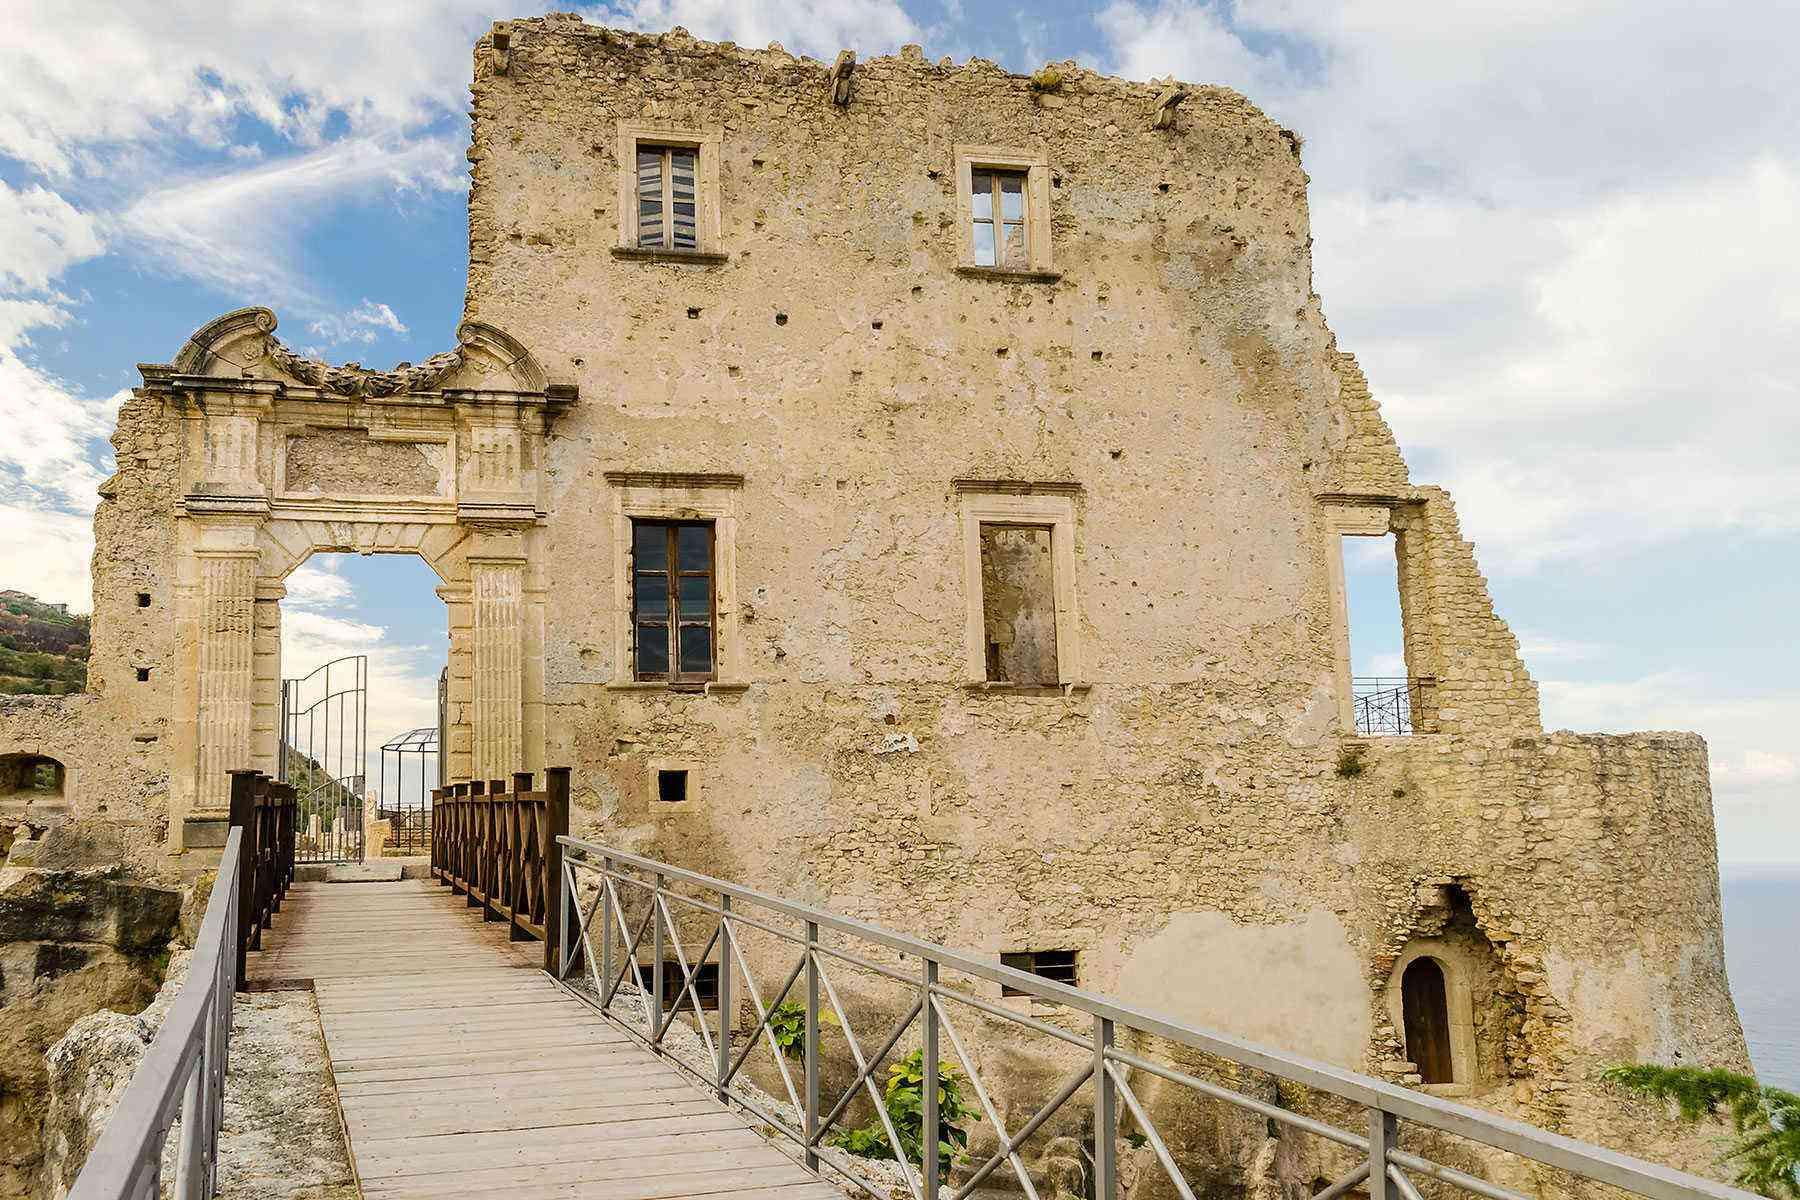 Medieval-Italian-Towns-Fiumefreddo-Bruzio-1